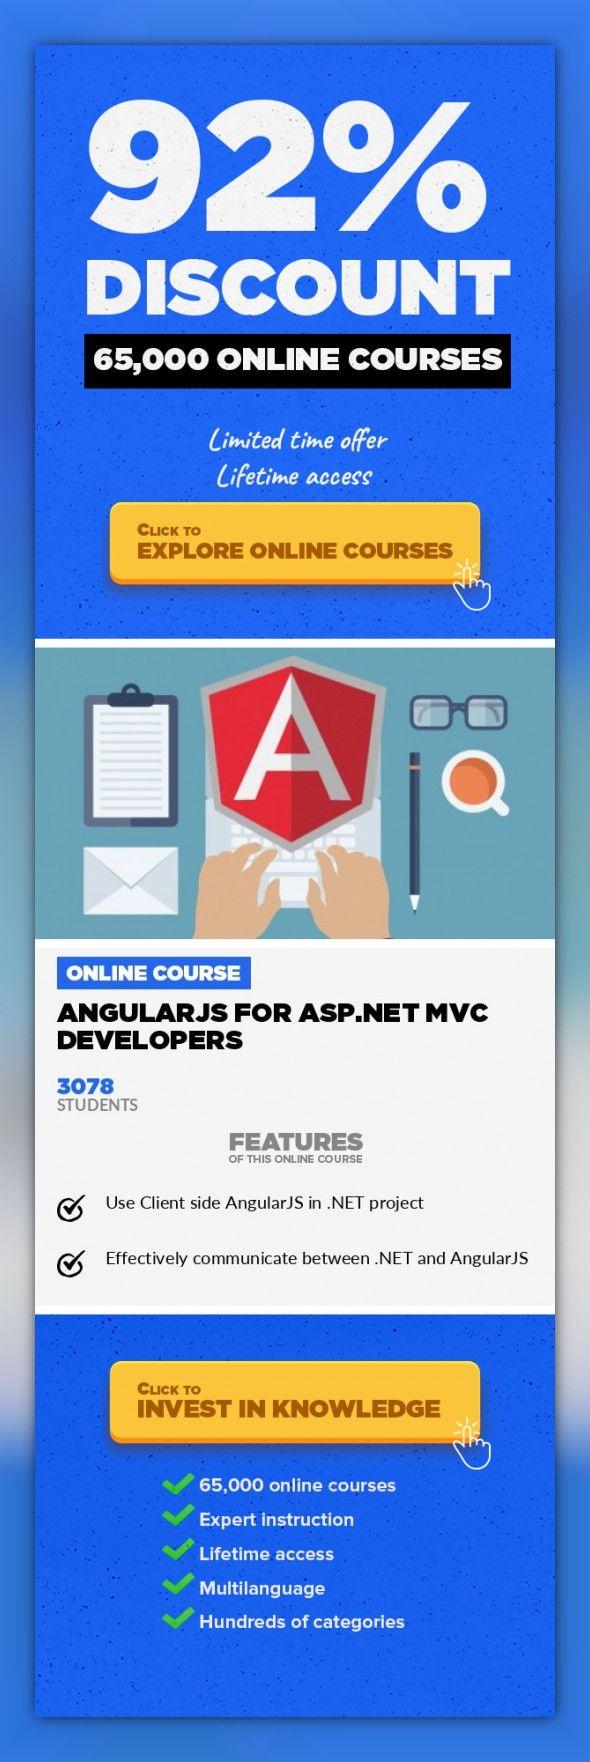 AngularJS For ASP.NET MVC Developers Web Development, Development ...